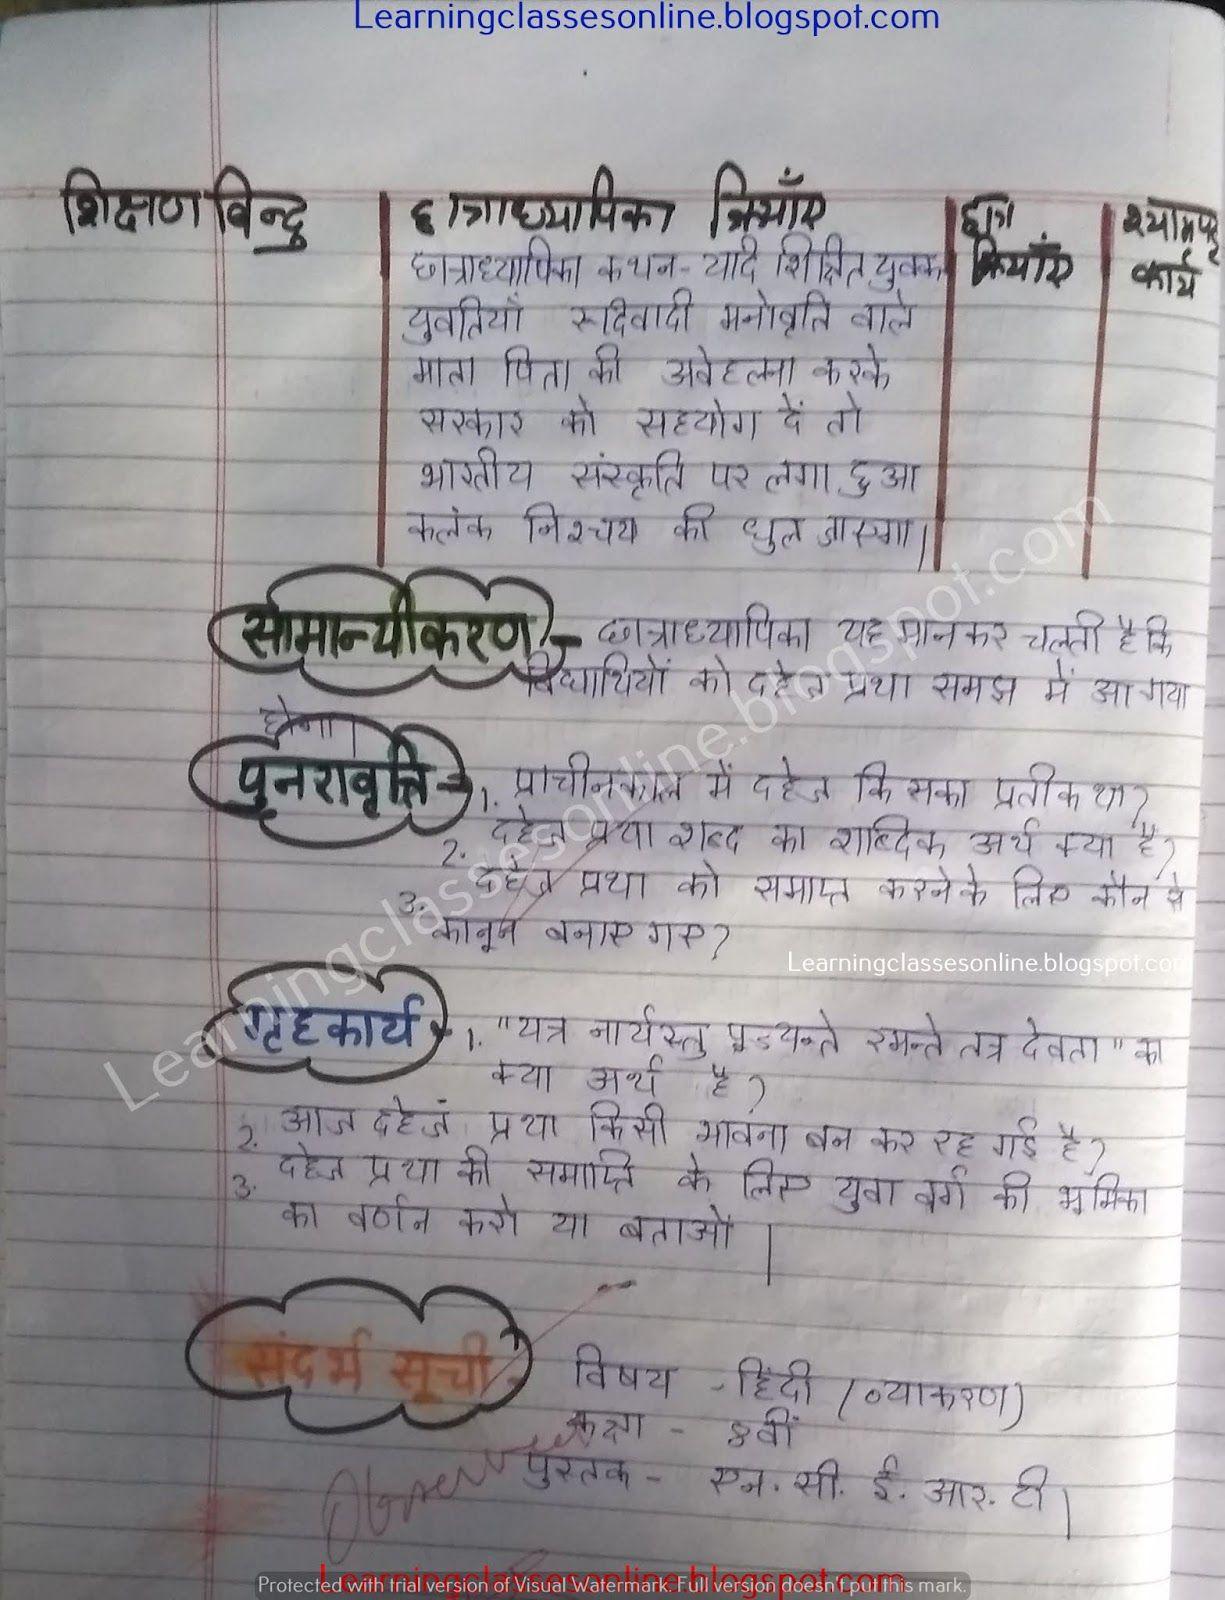 Lesson Plan In Hindi Pdf On Dahej Pratha Vyakaran Lesson Plan In Hindi How To Plan Lesson [ 1600 x 1225 Pixel ]